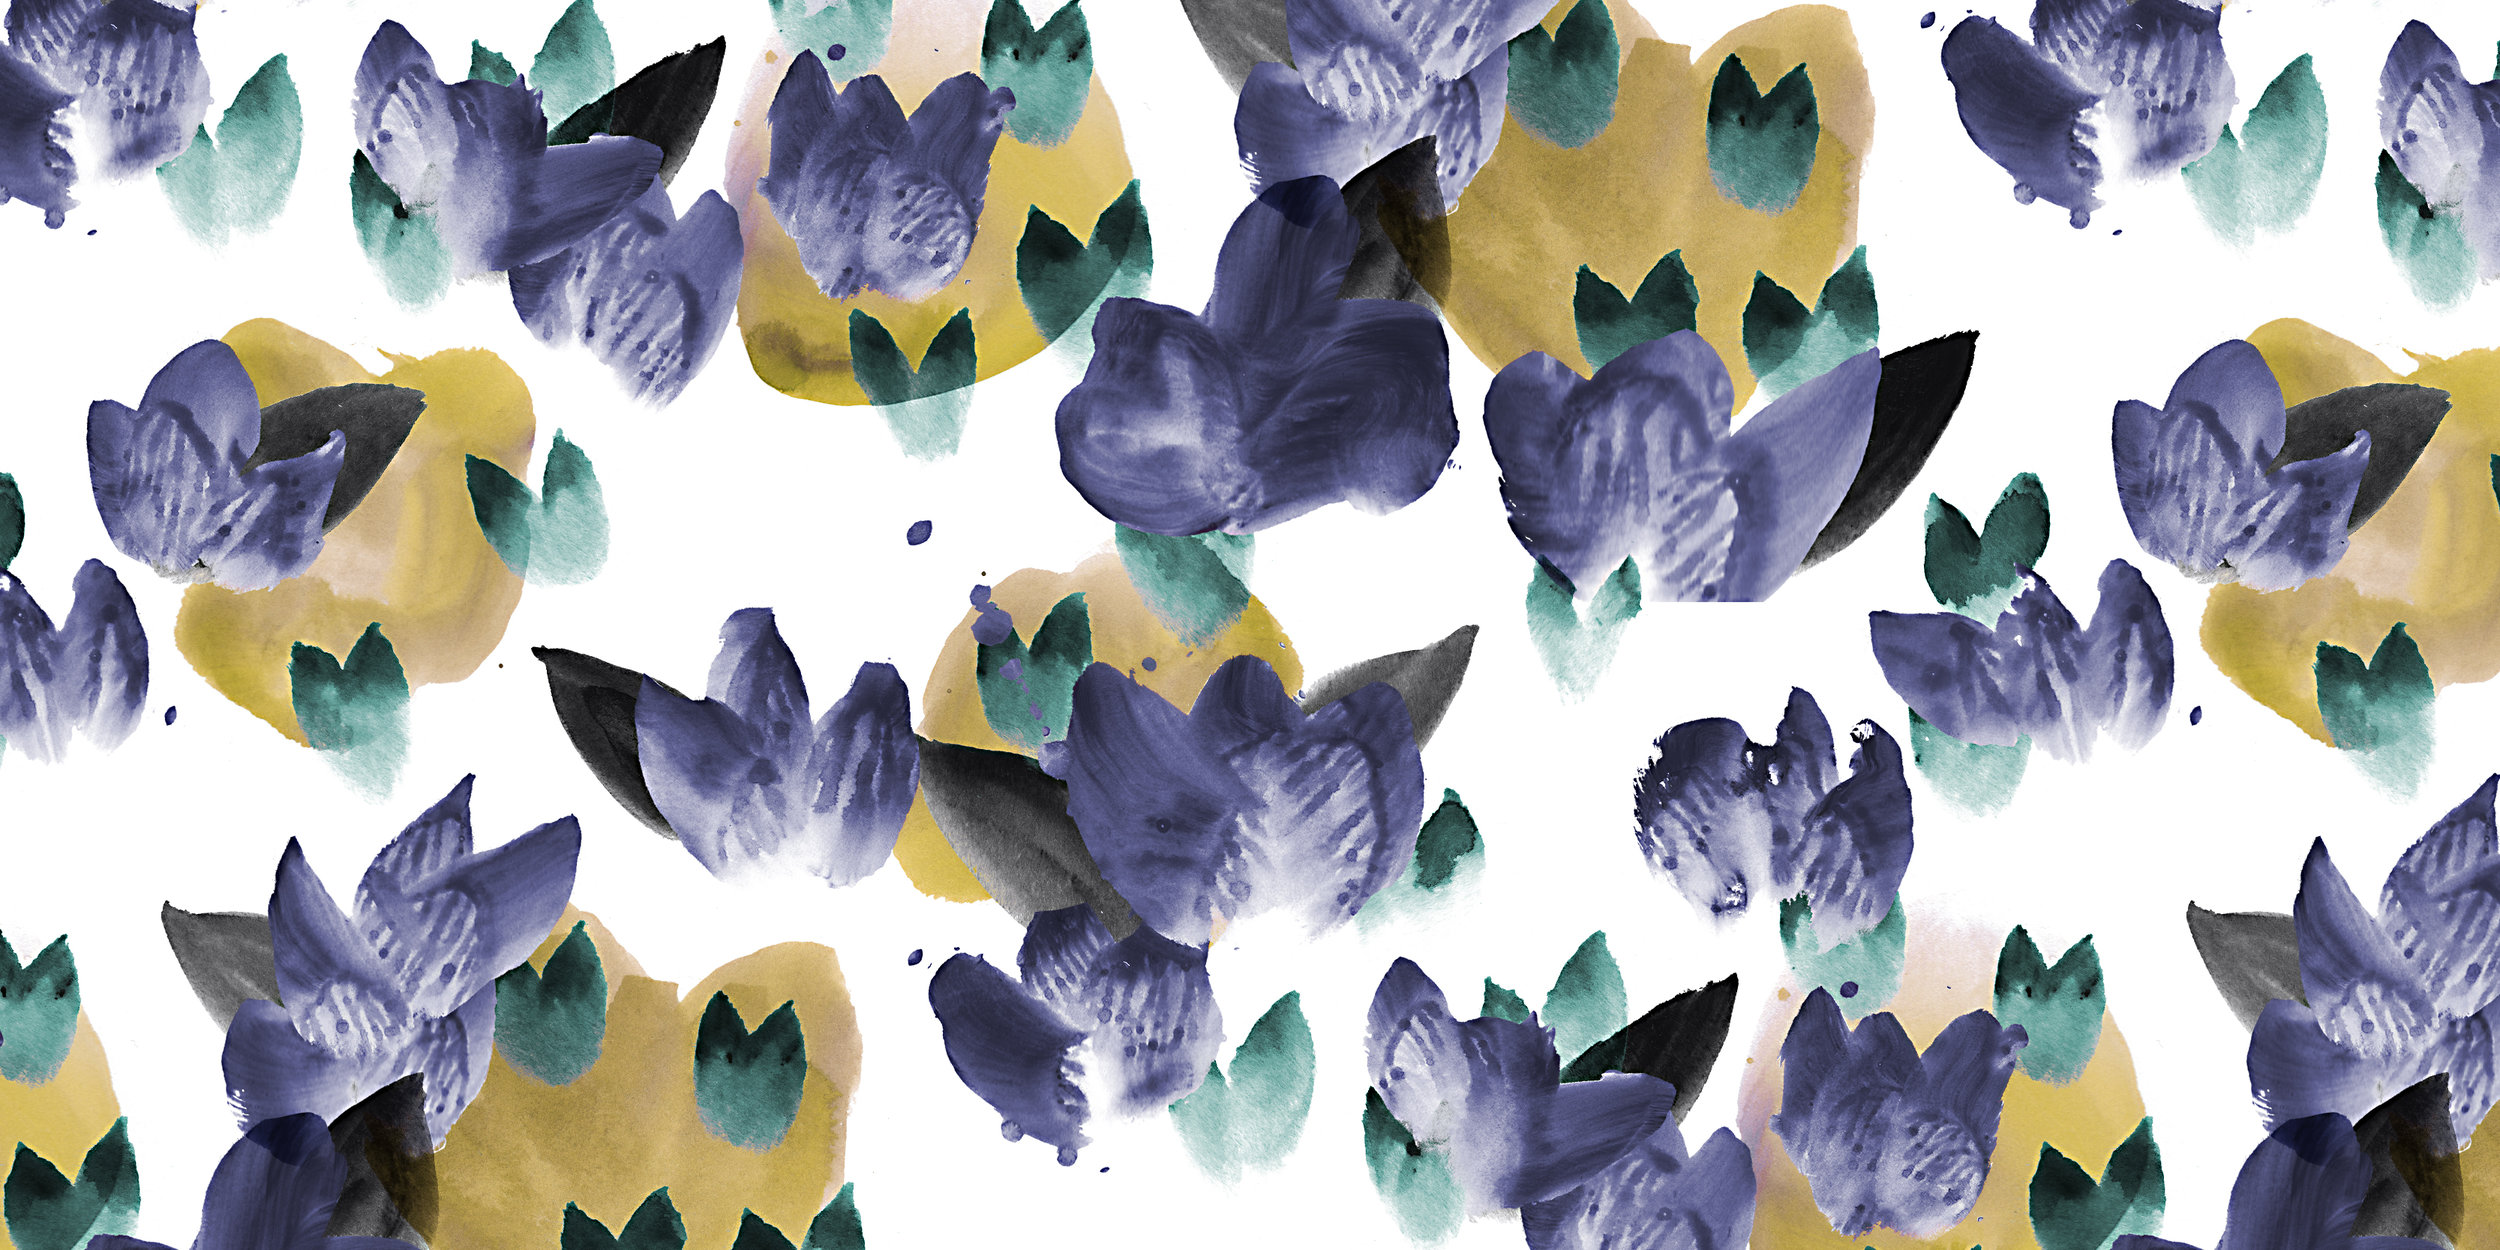 PatternsForWebsite_Wide_AbstractFlowers2.jpg